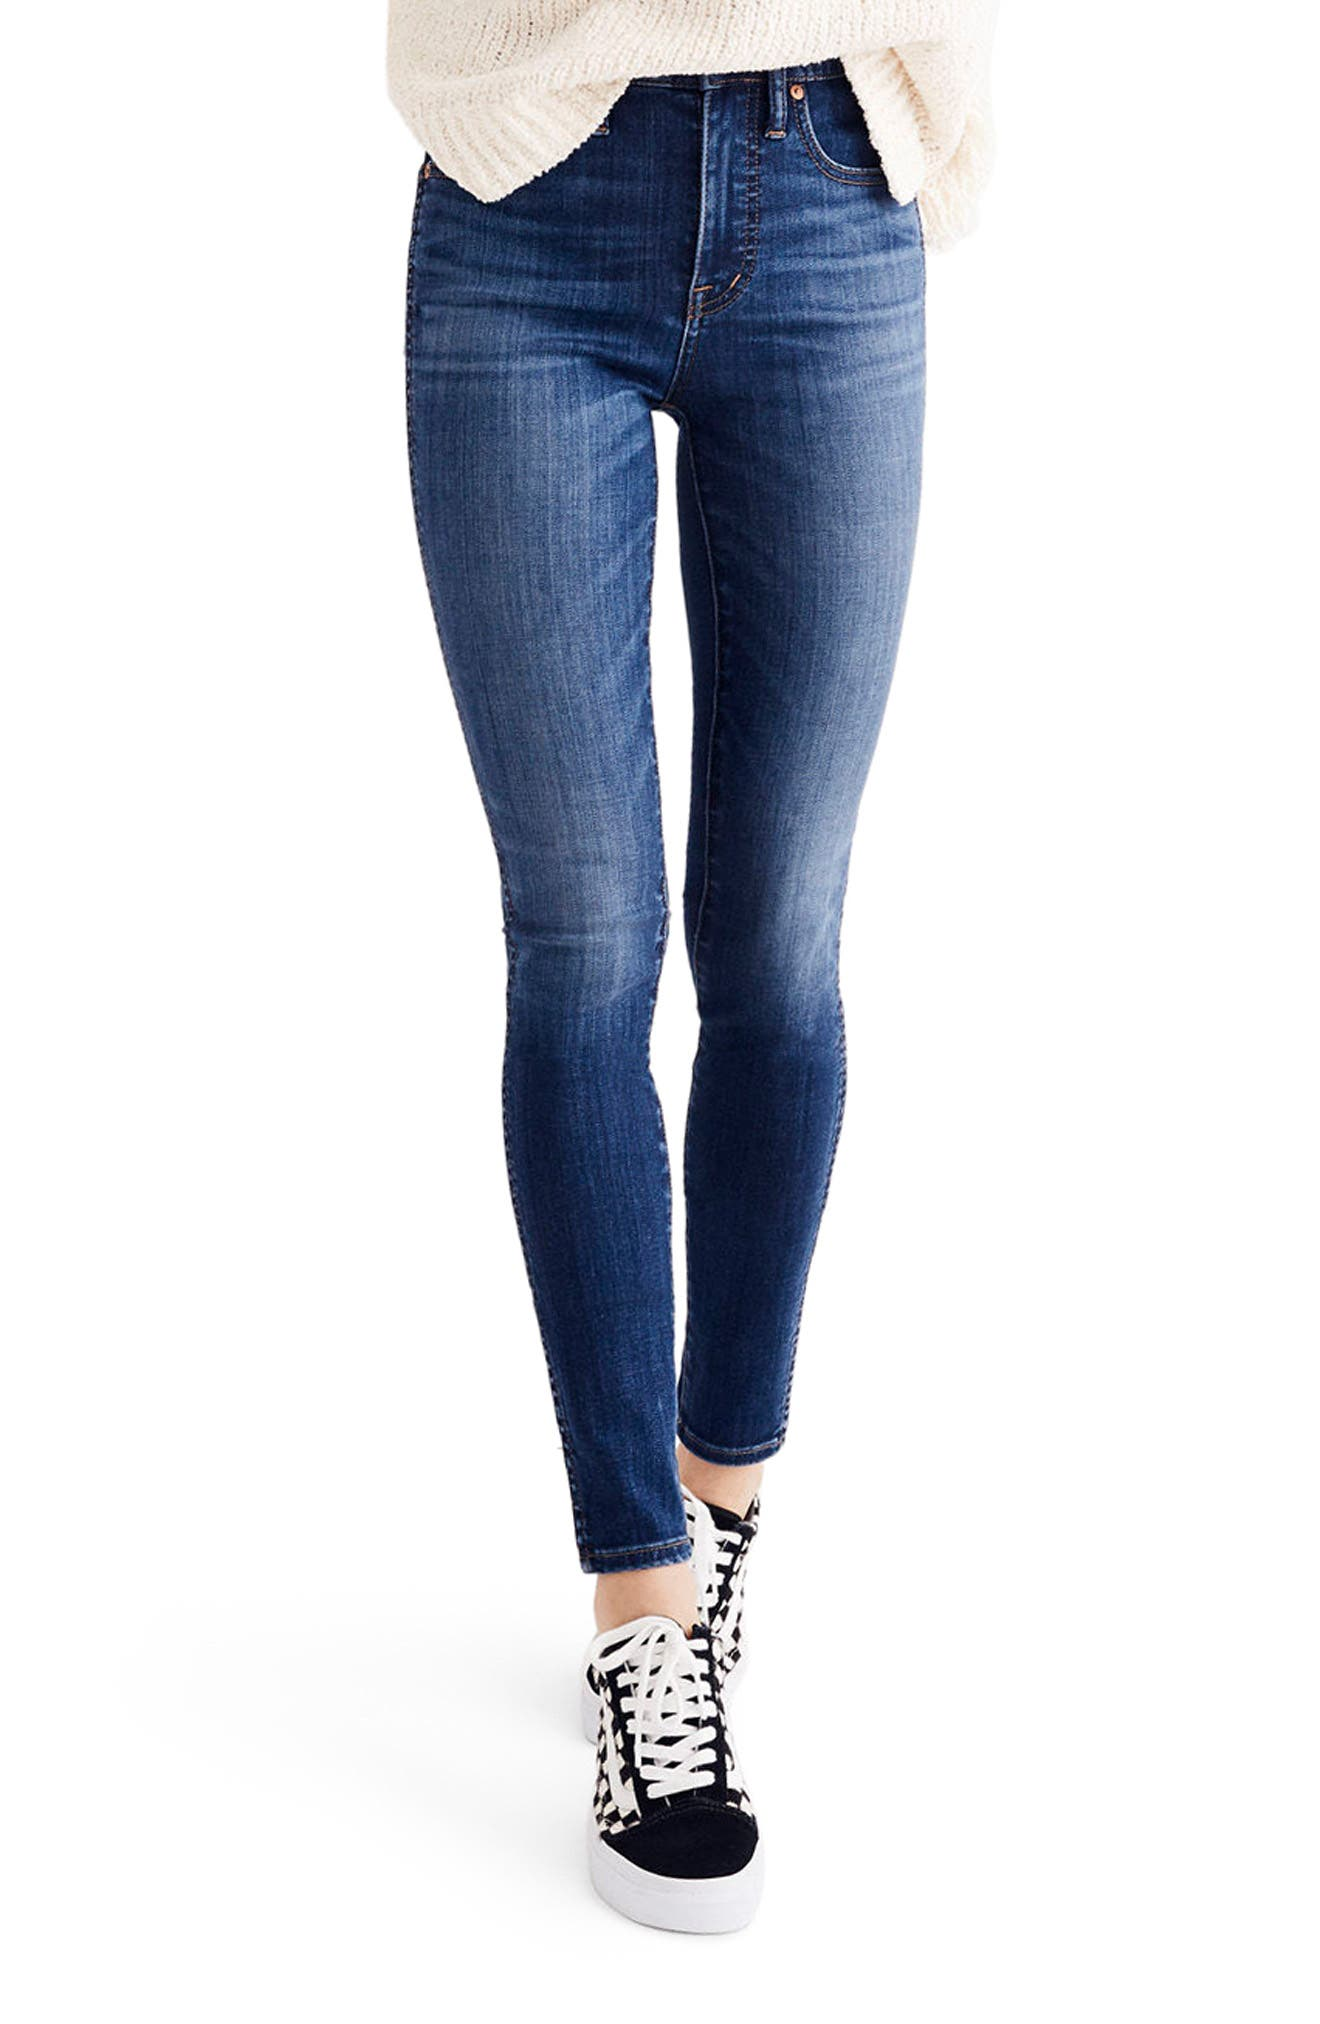 Main Image - Madewell 10-Inch High Waist Skinny Jeans (Danny)(Petite)